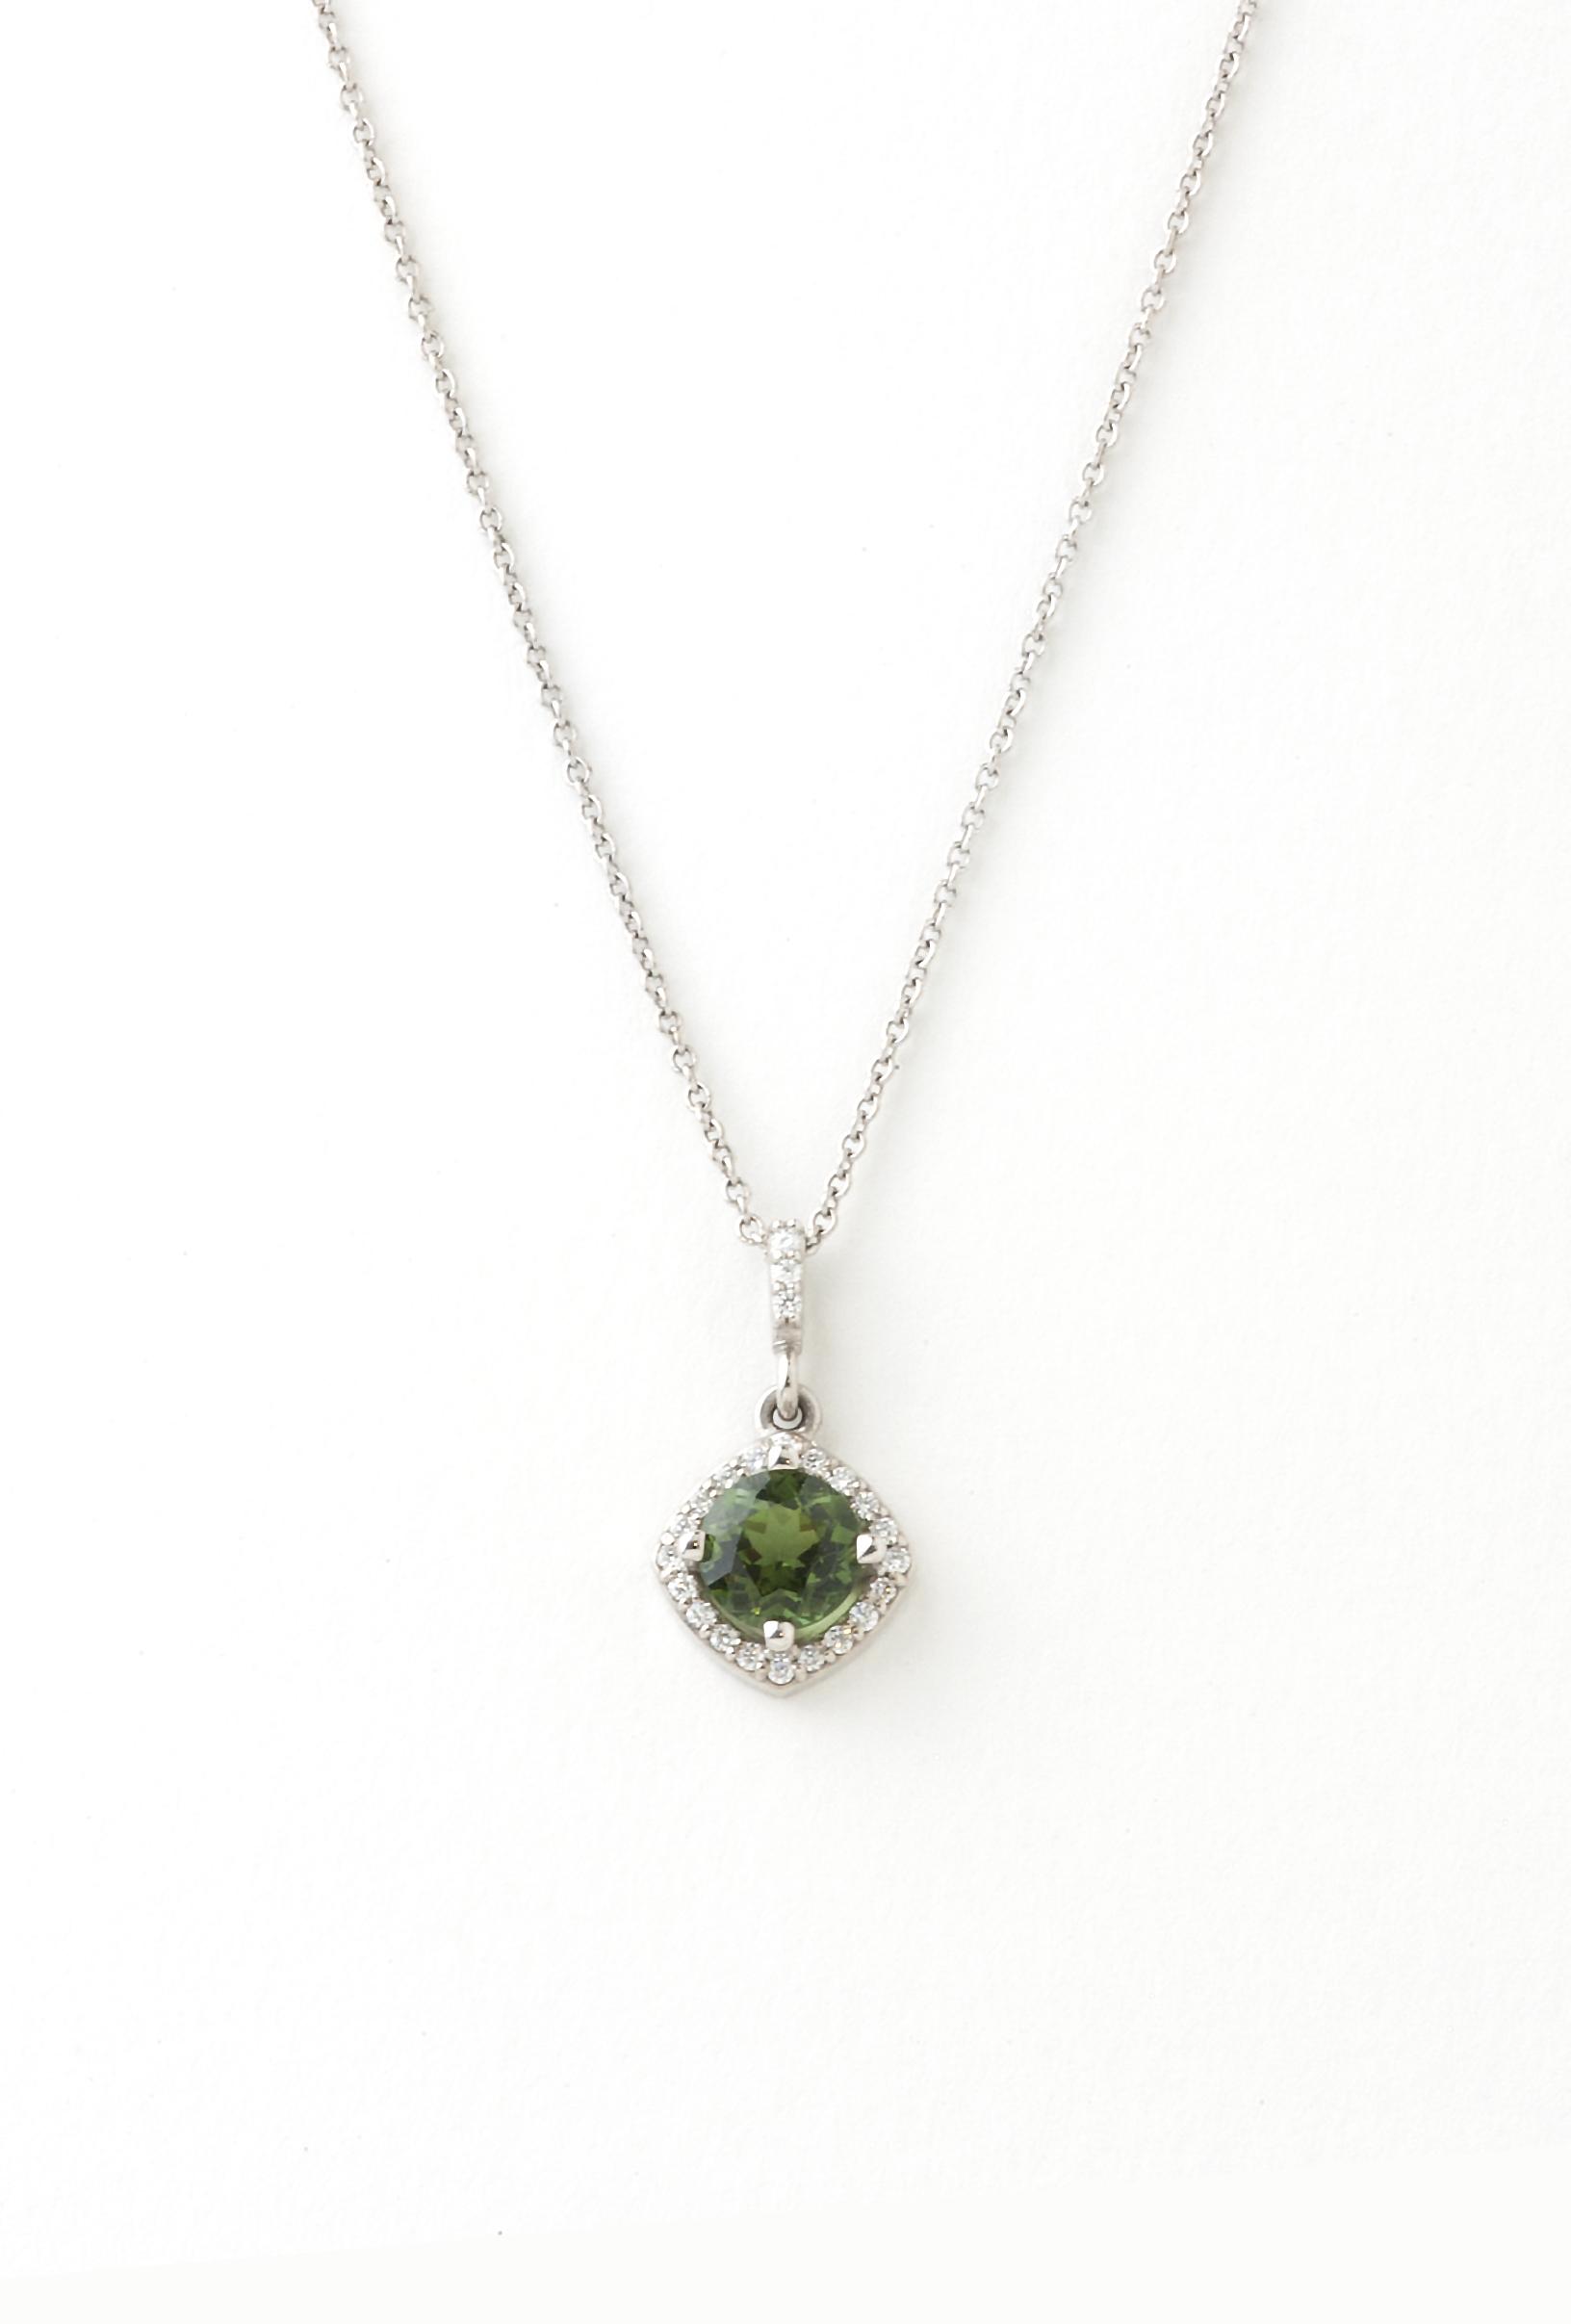 Green tourmaline and diamond pendent